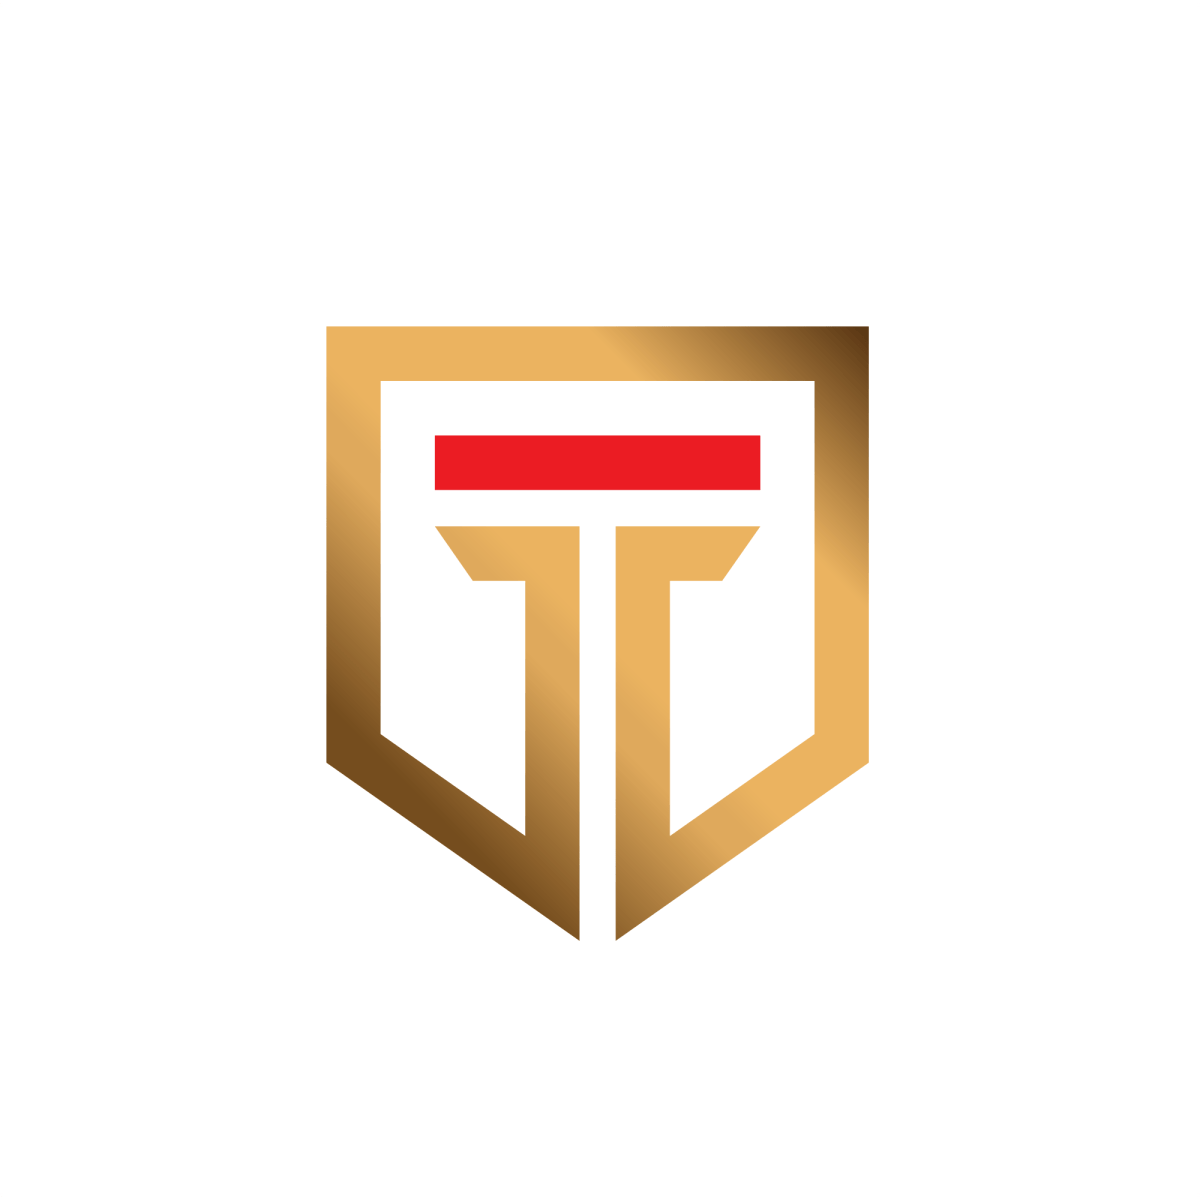 Taksoo Letter Logo Letter T Lettering